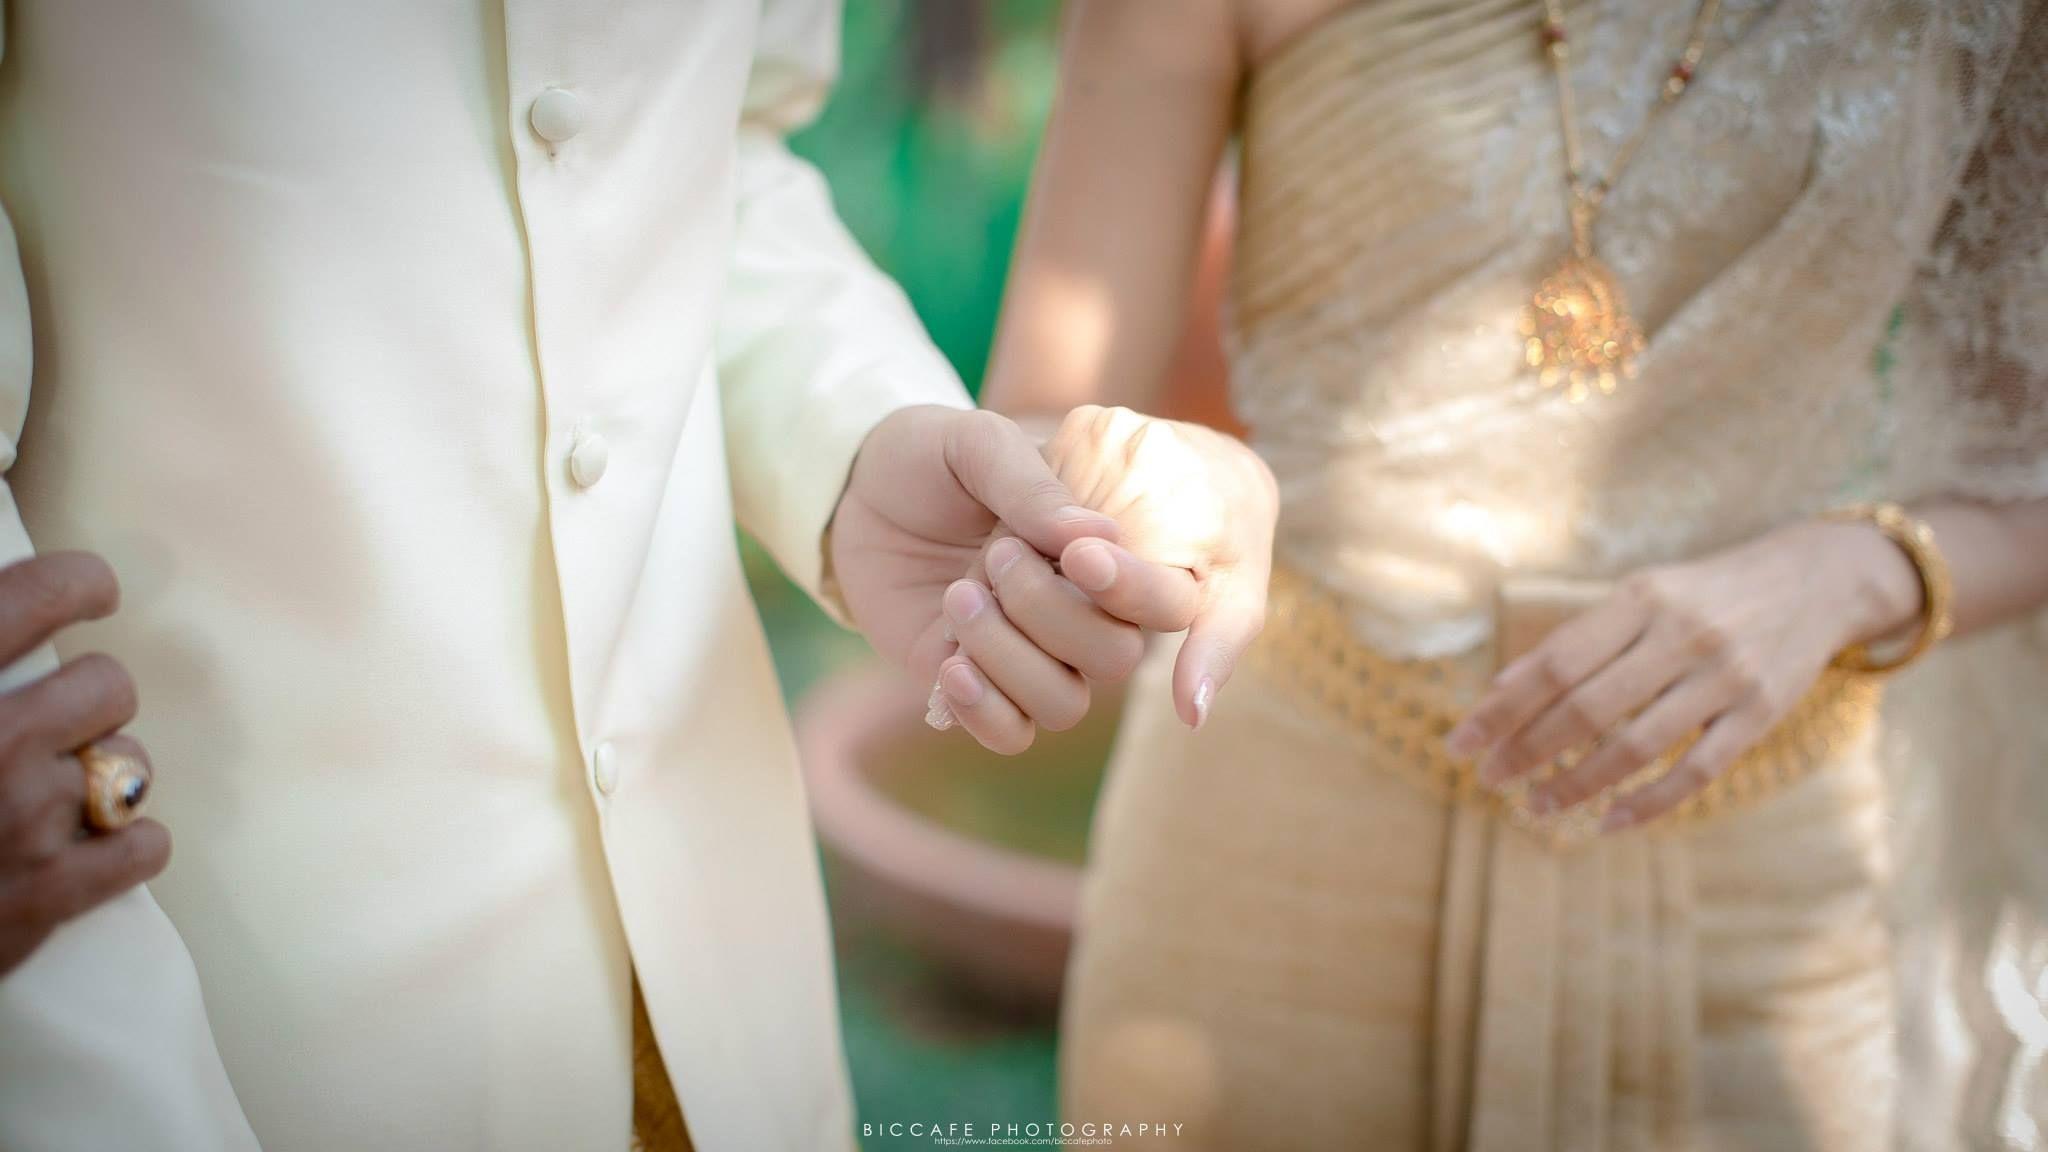 Wedding Ceremony gift & fame